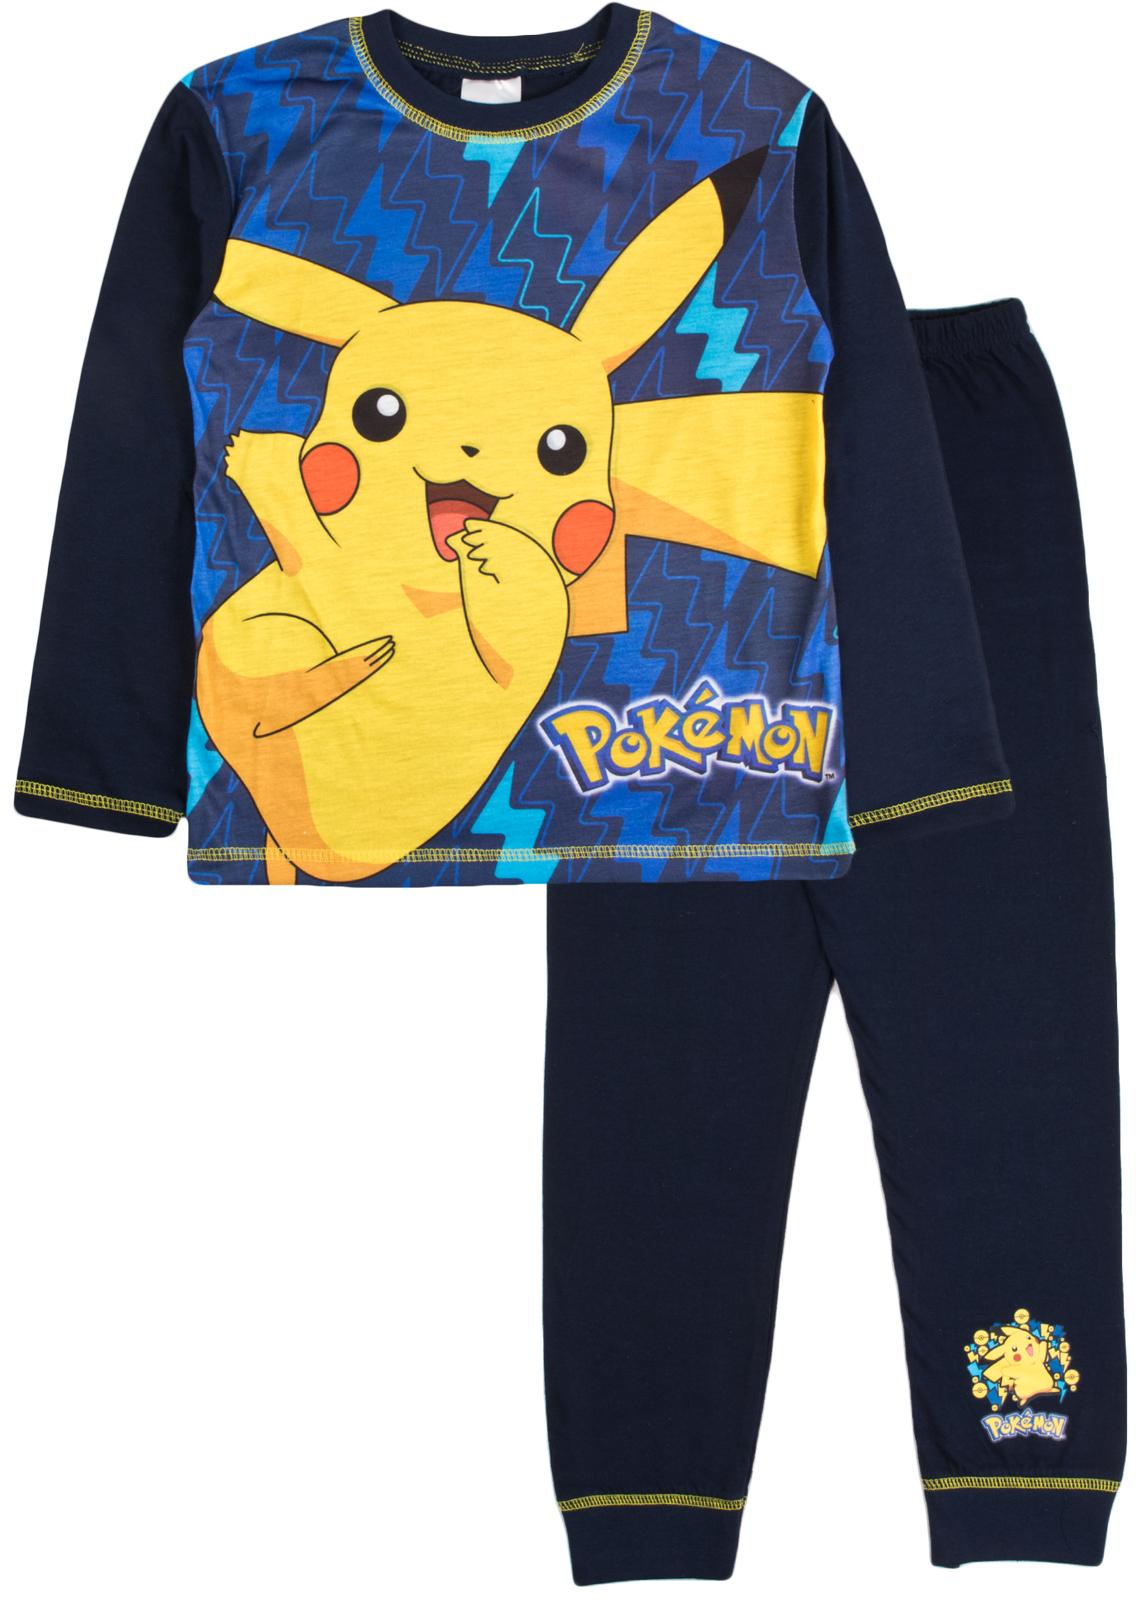 boys pokemon go pyjamas full length pikachu pjs 2 piece pyjama set kids size ebay. Black Bedroom Furniture Sets. Home Design Ideas